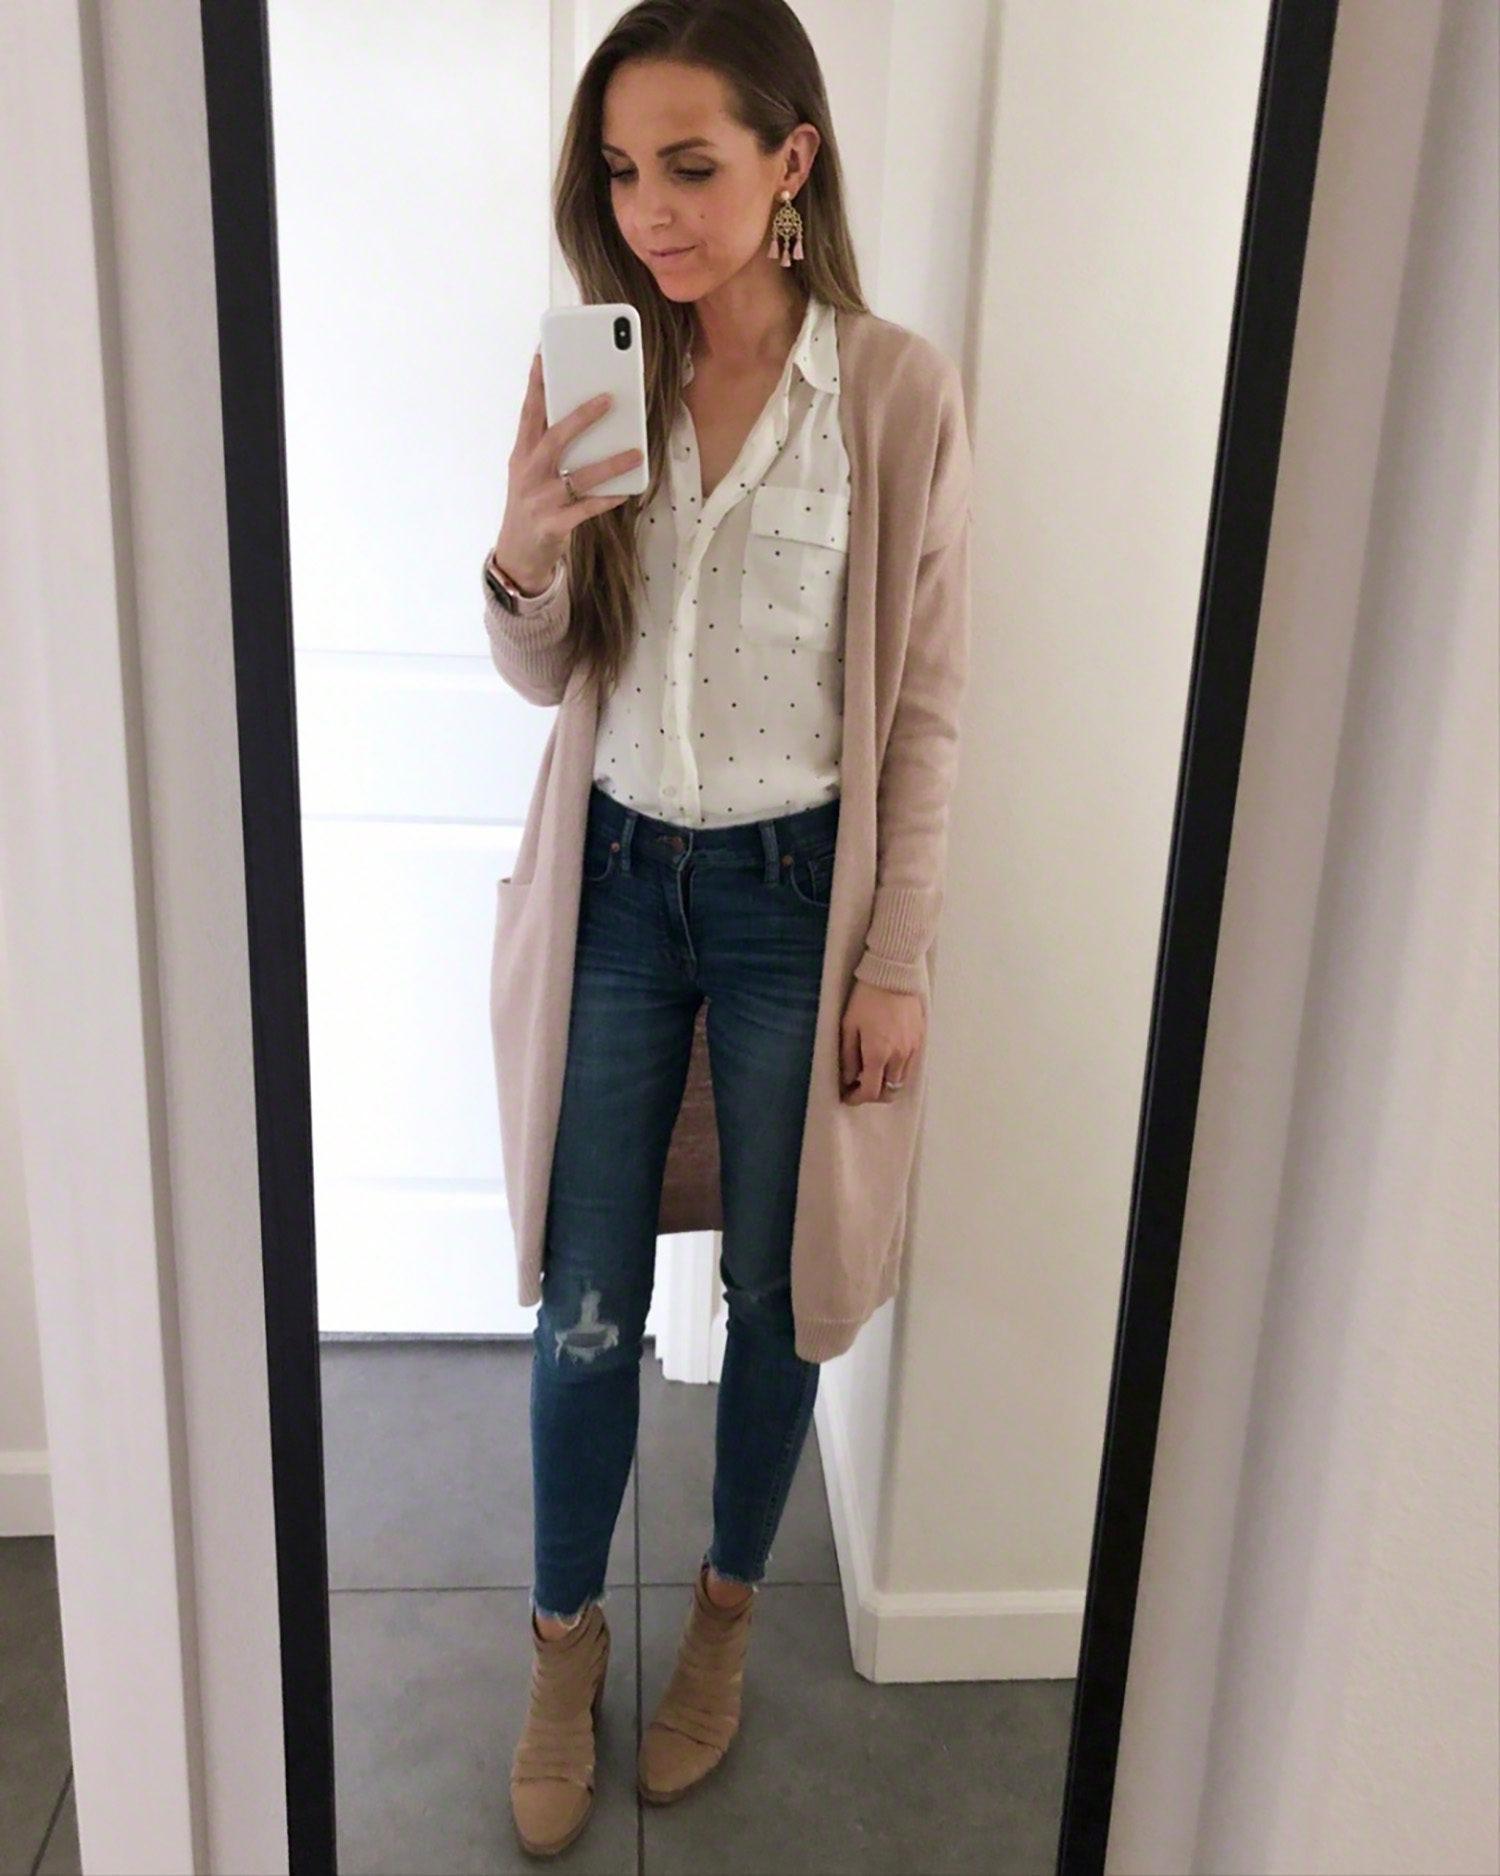 white blouse and blush cardigan | merricksart.com